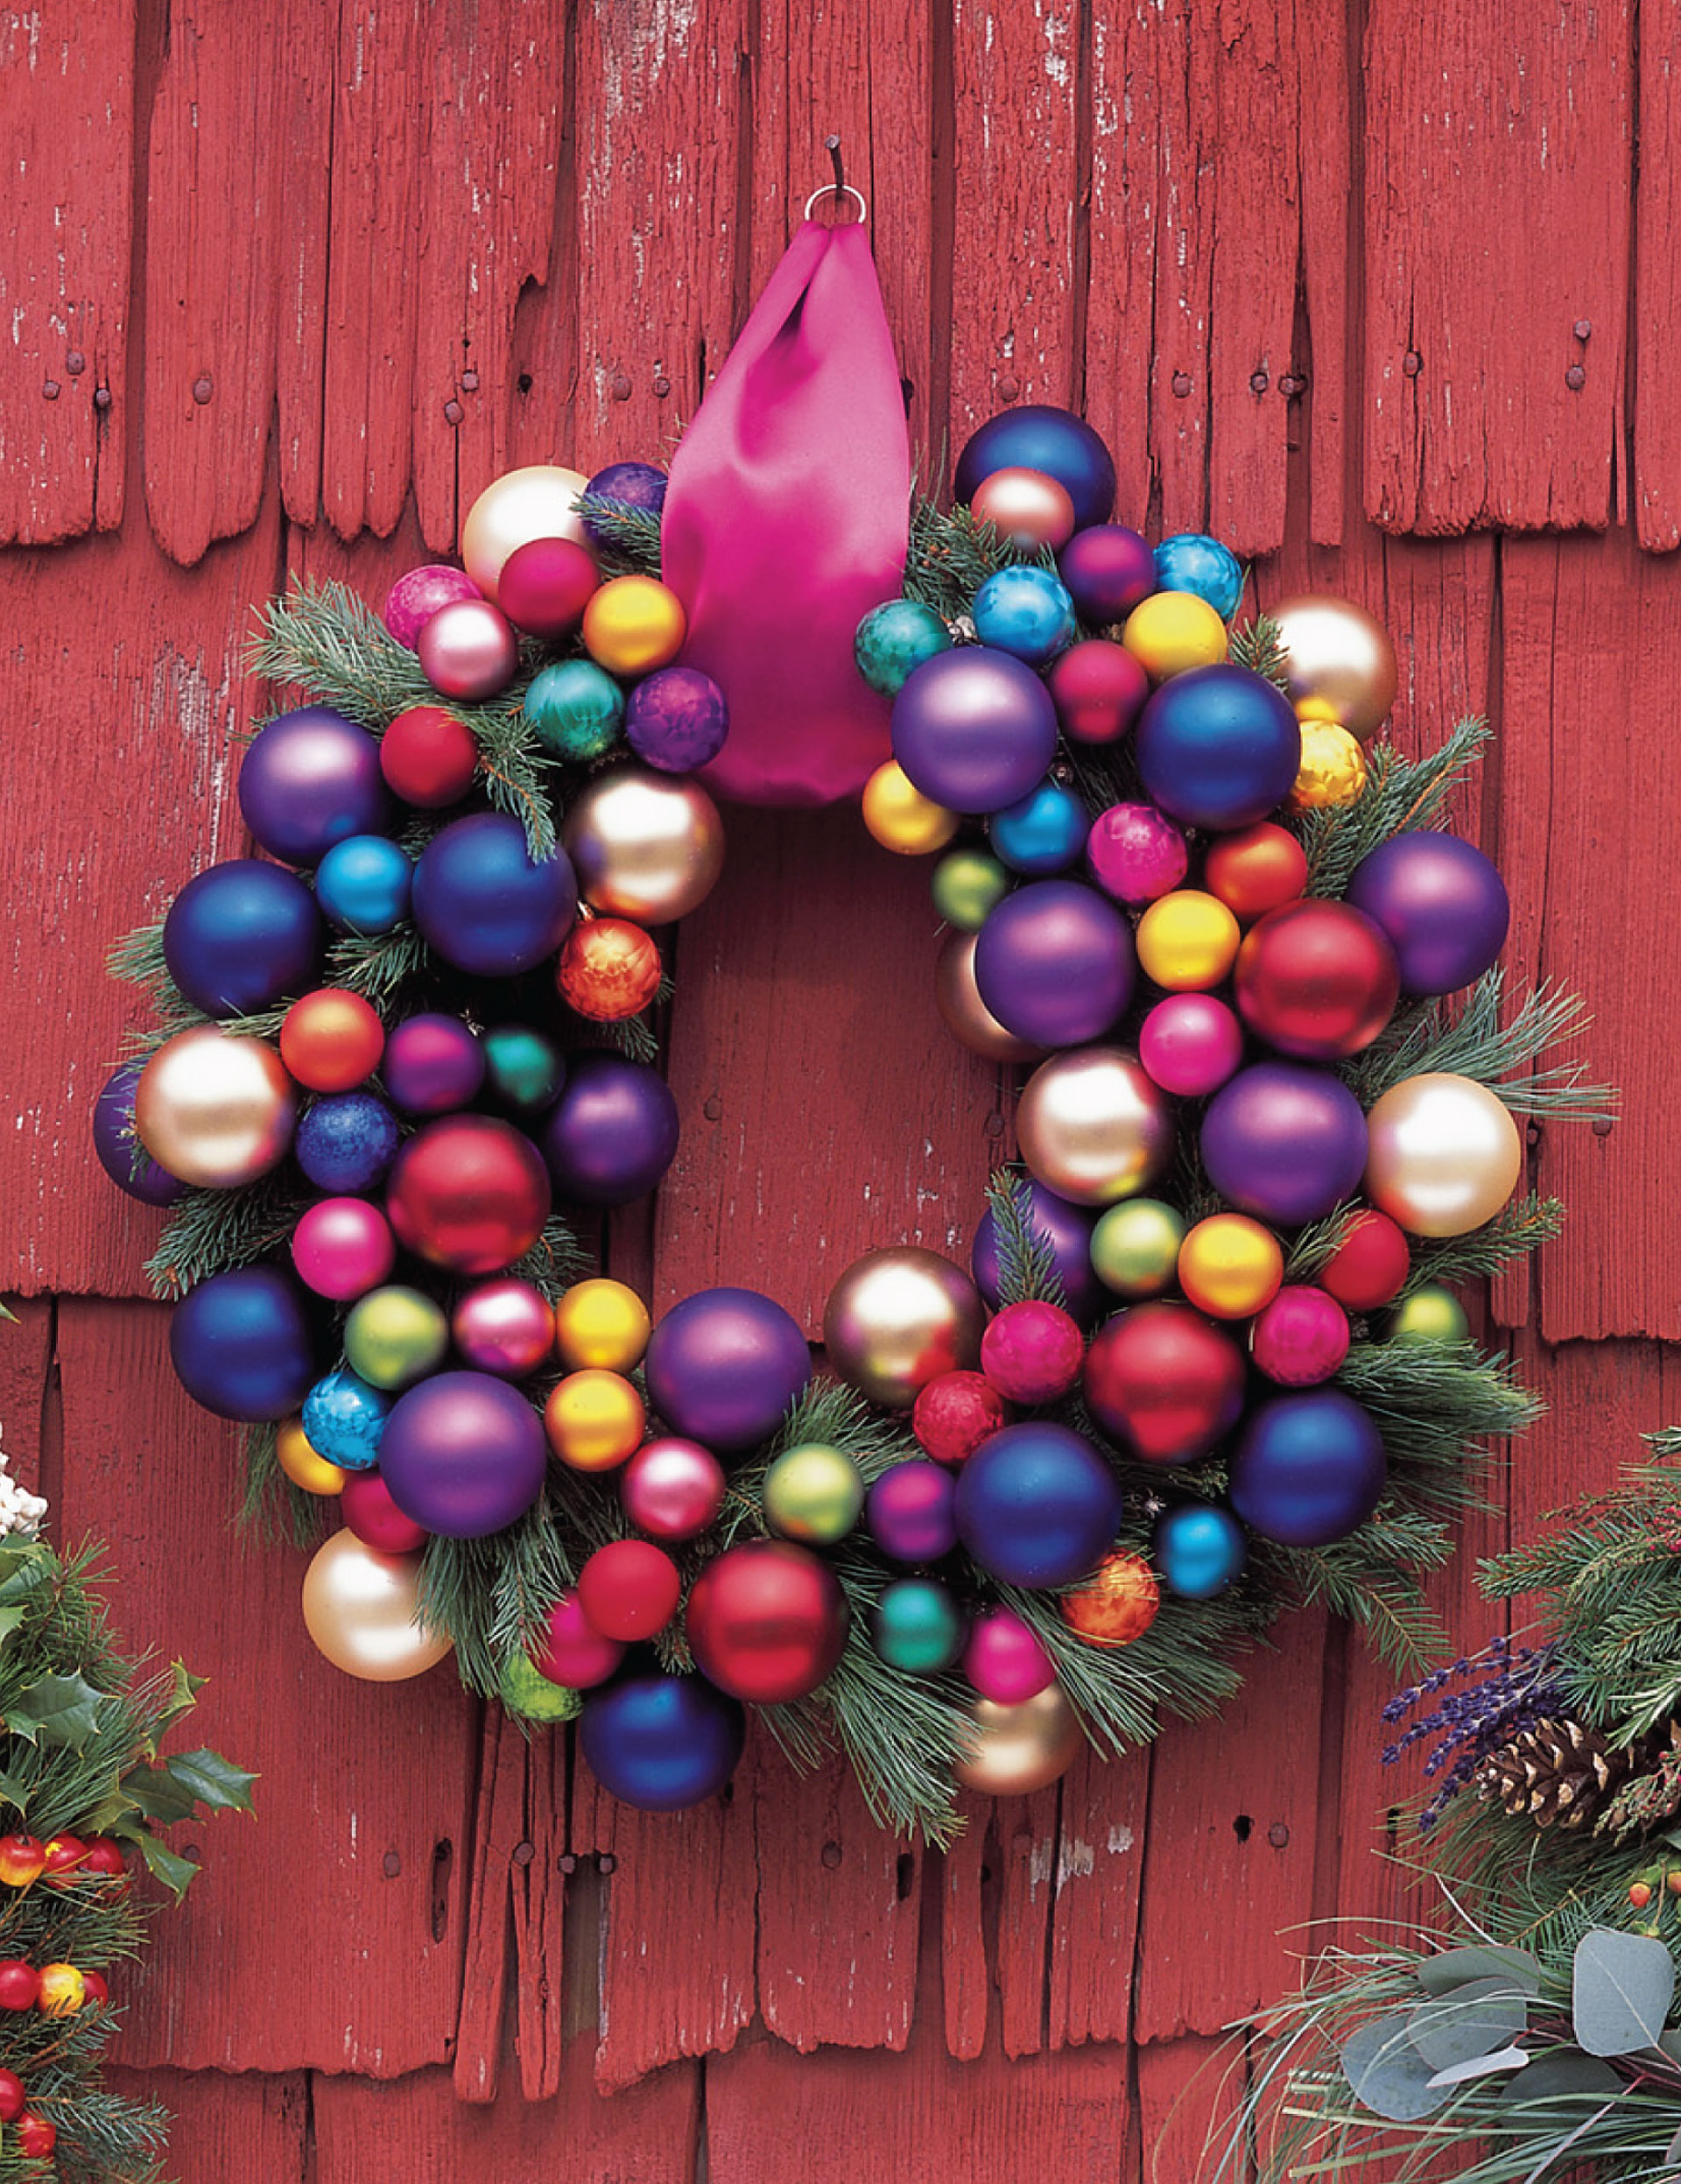 5500377de4ea2-ghk-christmas-wreath-craft-decorate-ornament-s2